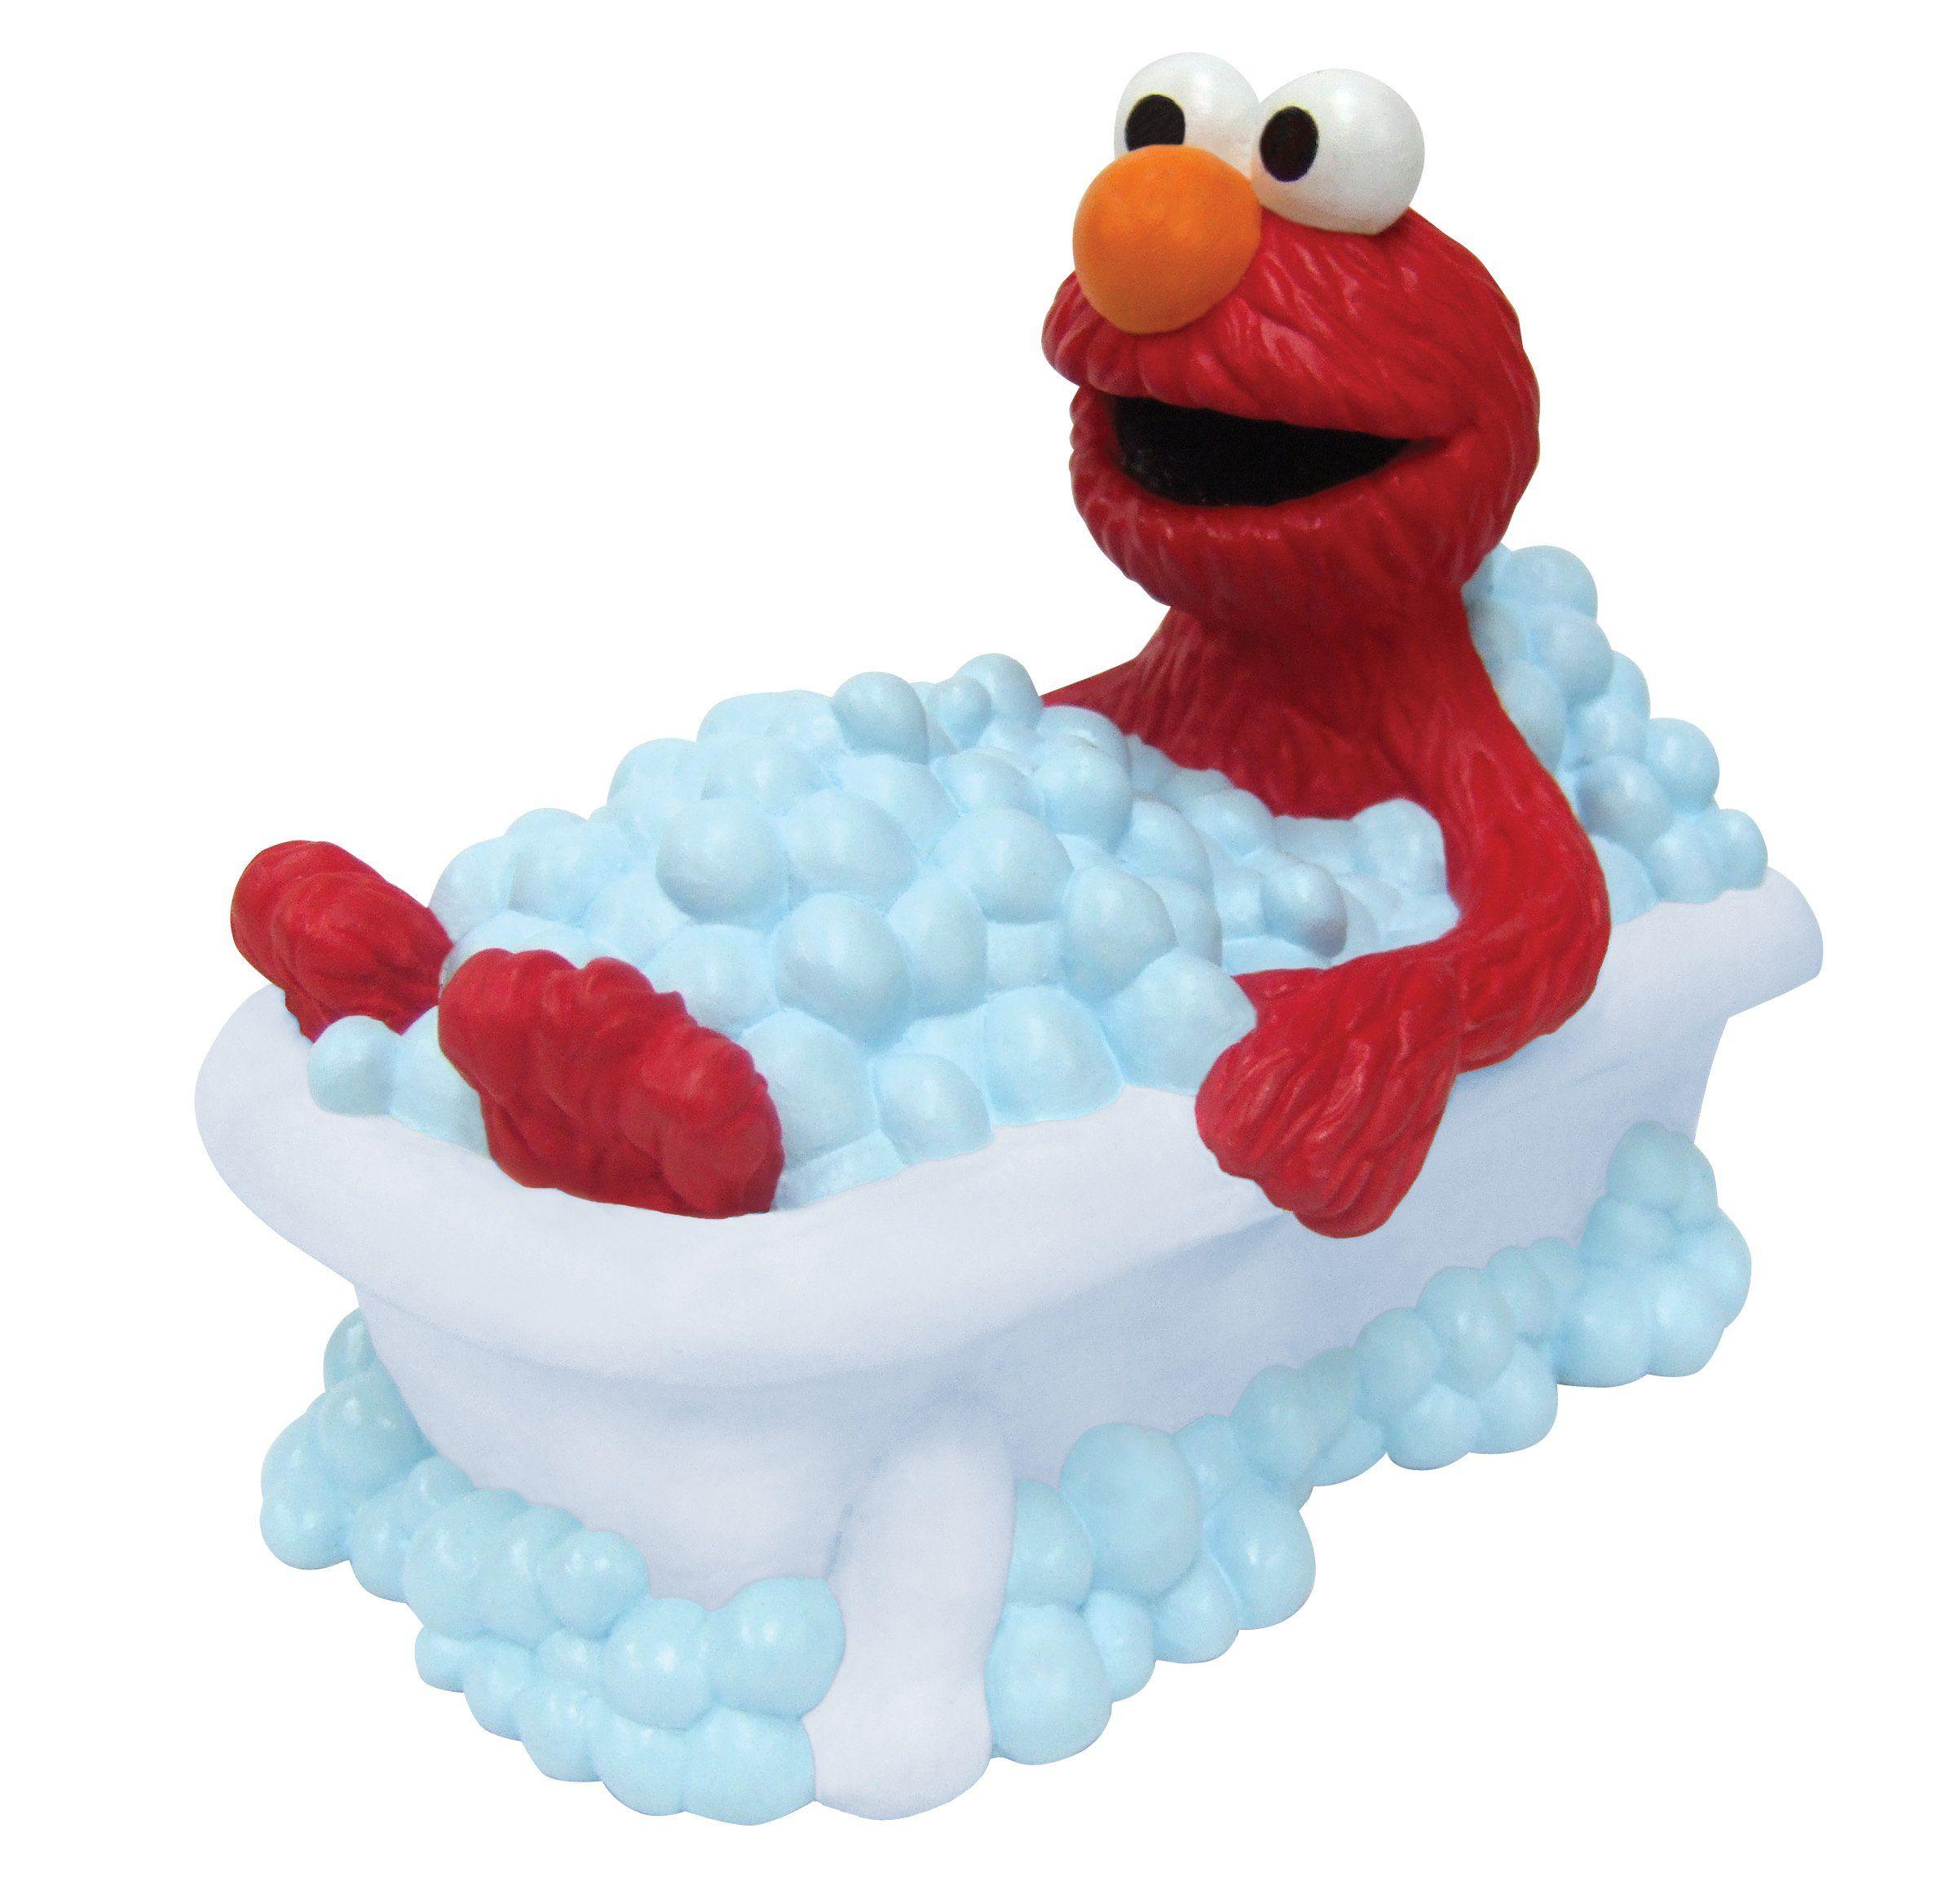 Sesame Street Bath Tub Faucet Cover - Elmo   Crafts   Pinterest ...